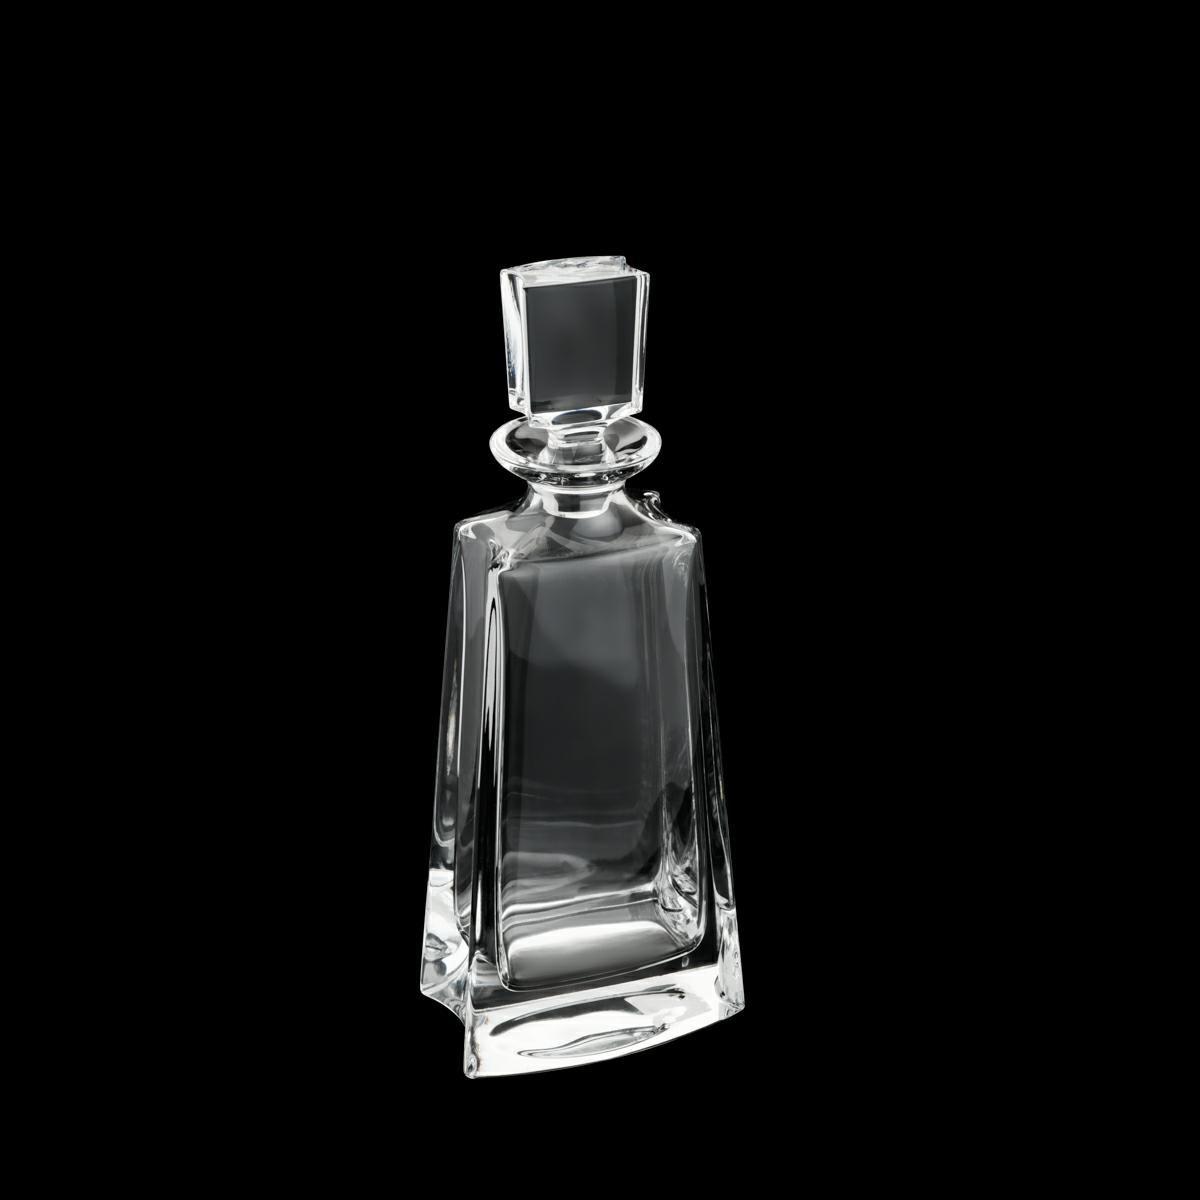 Garrafa 700ml para whisky de cristal transparente Kathrene Alta Bohemia - 35149